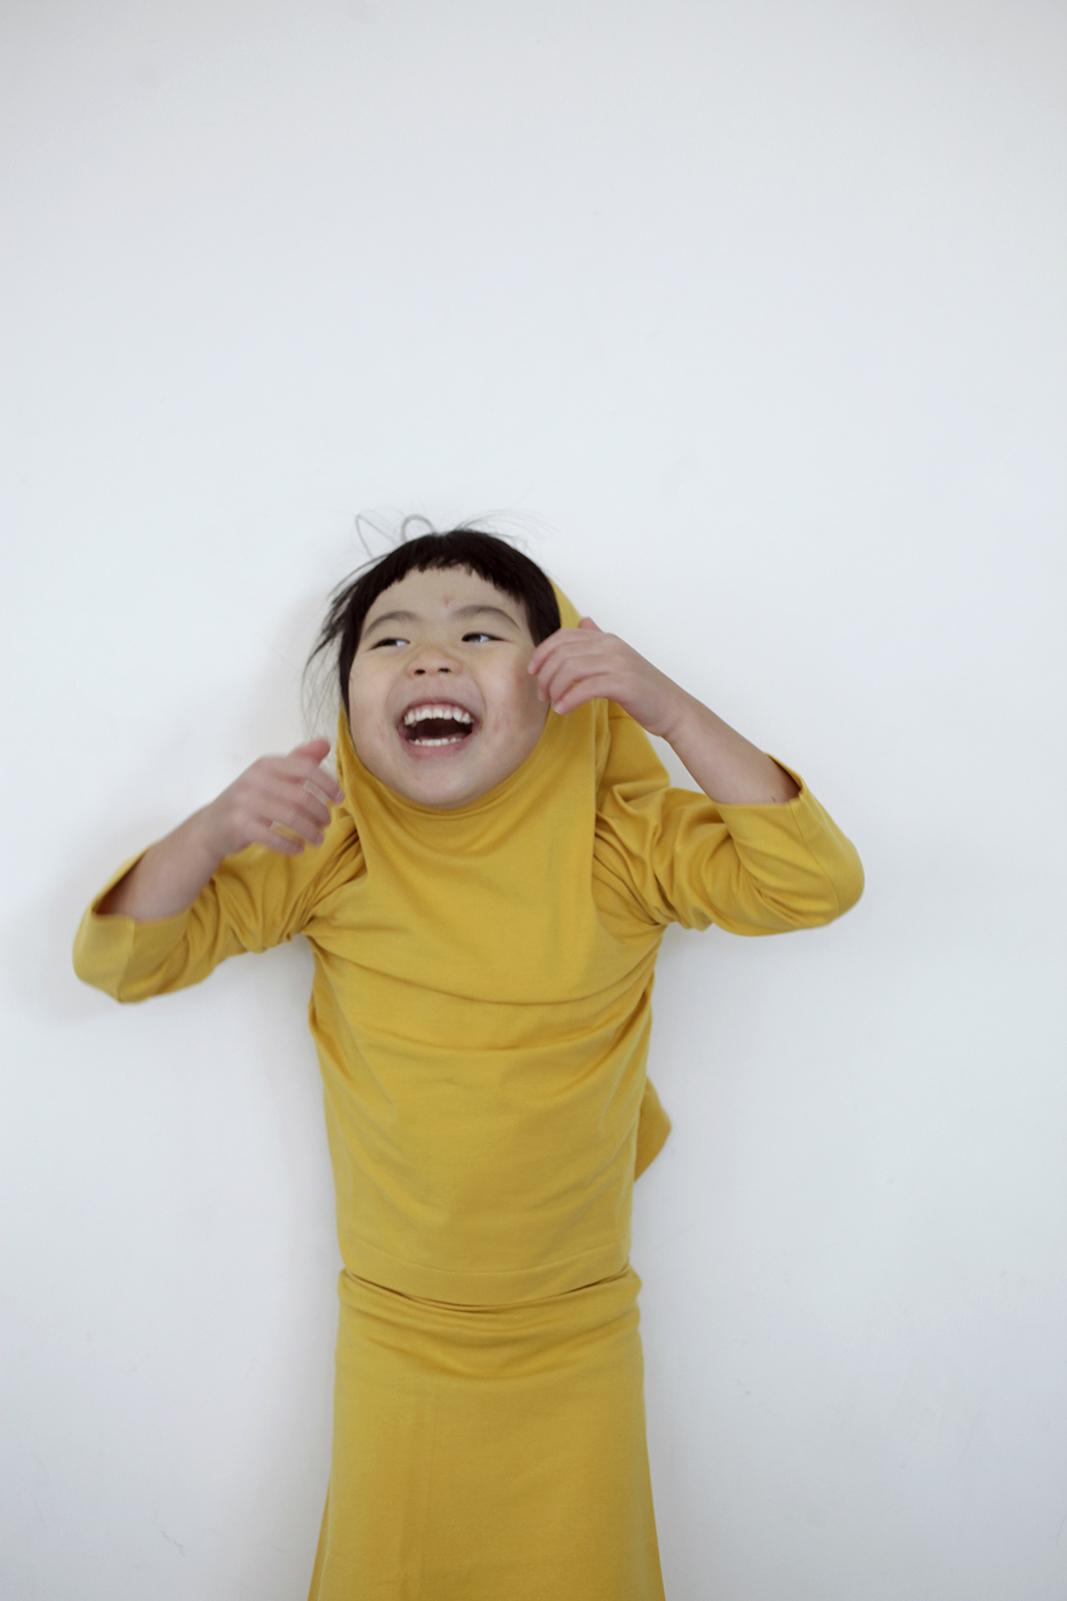 Camphor カンフル kids こども 子供服 longtee 日本製 madeinjapan